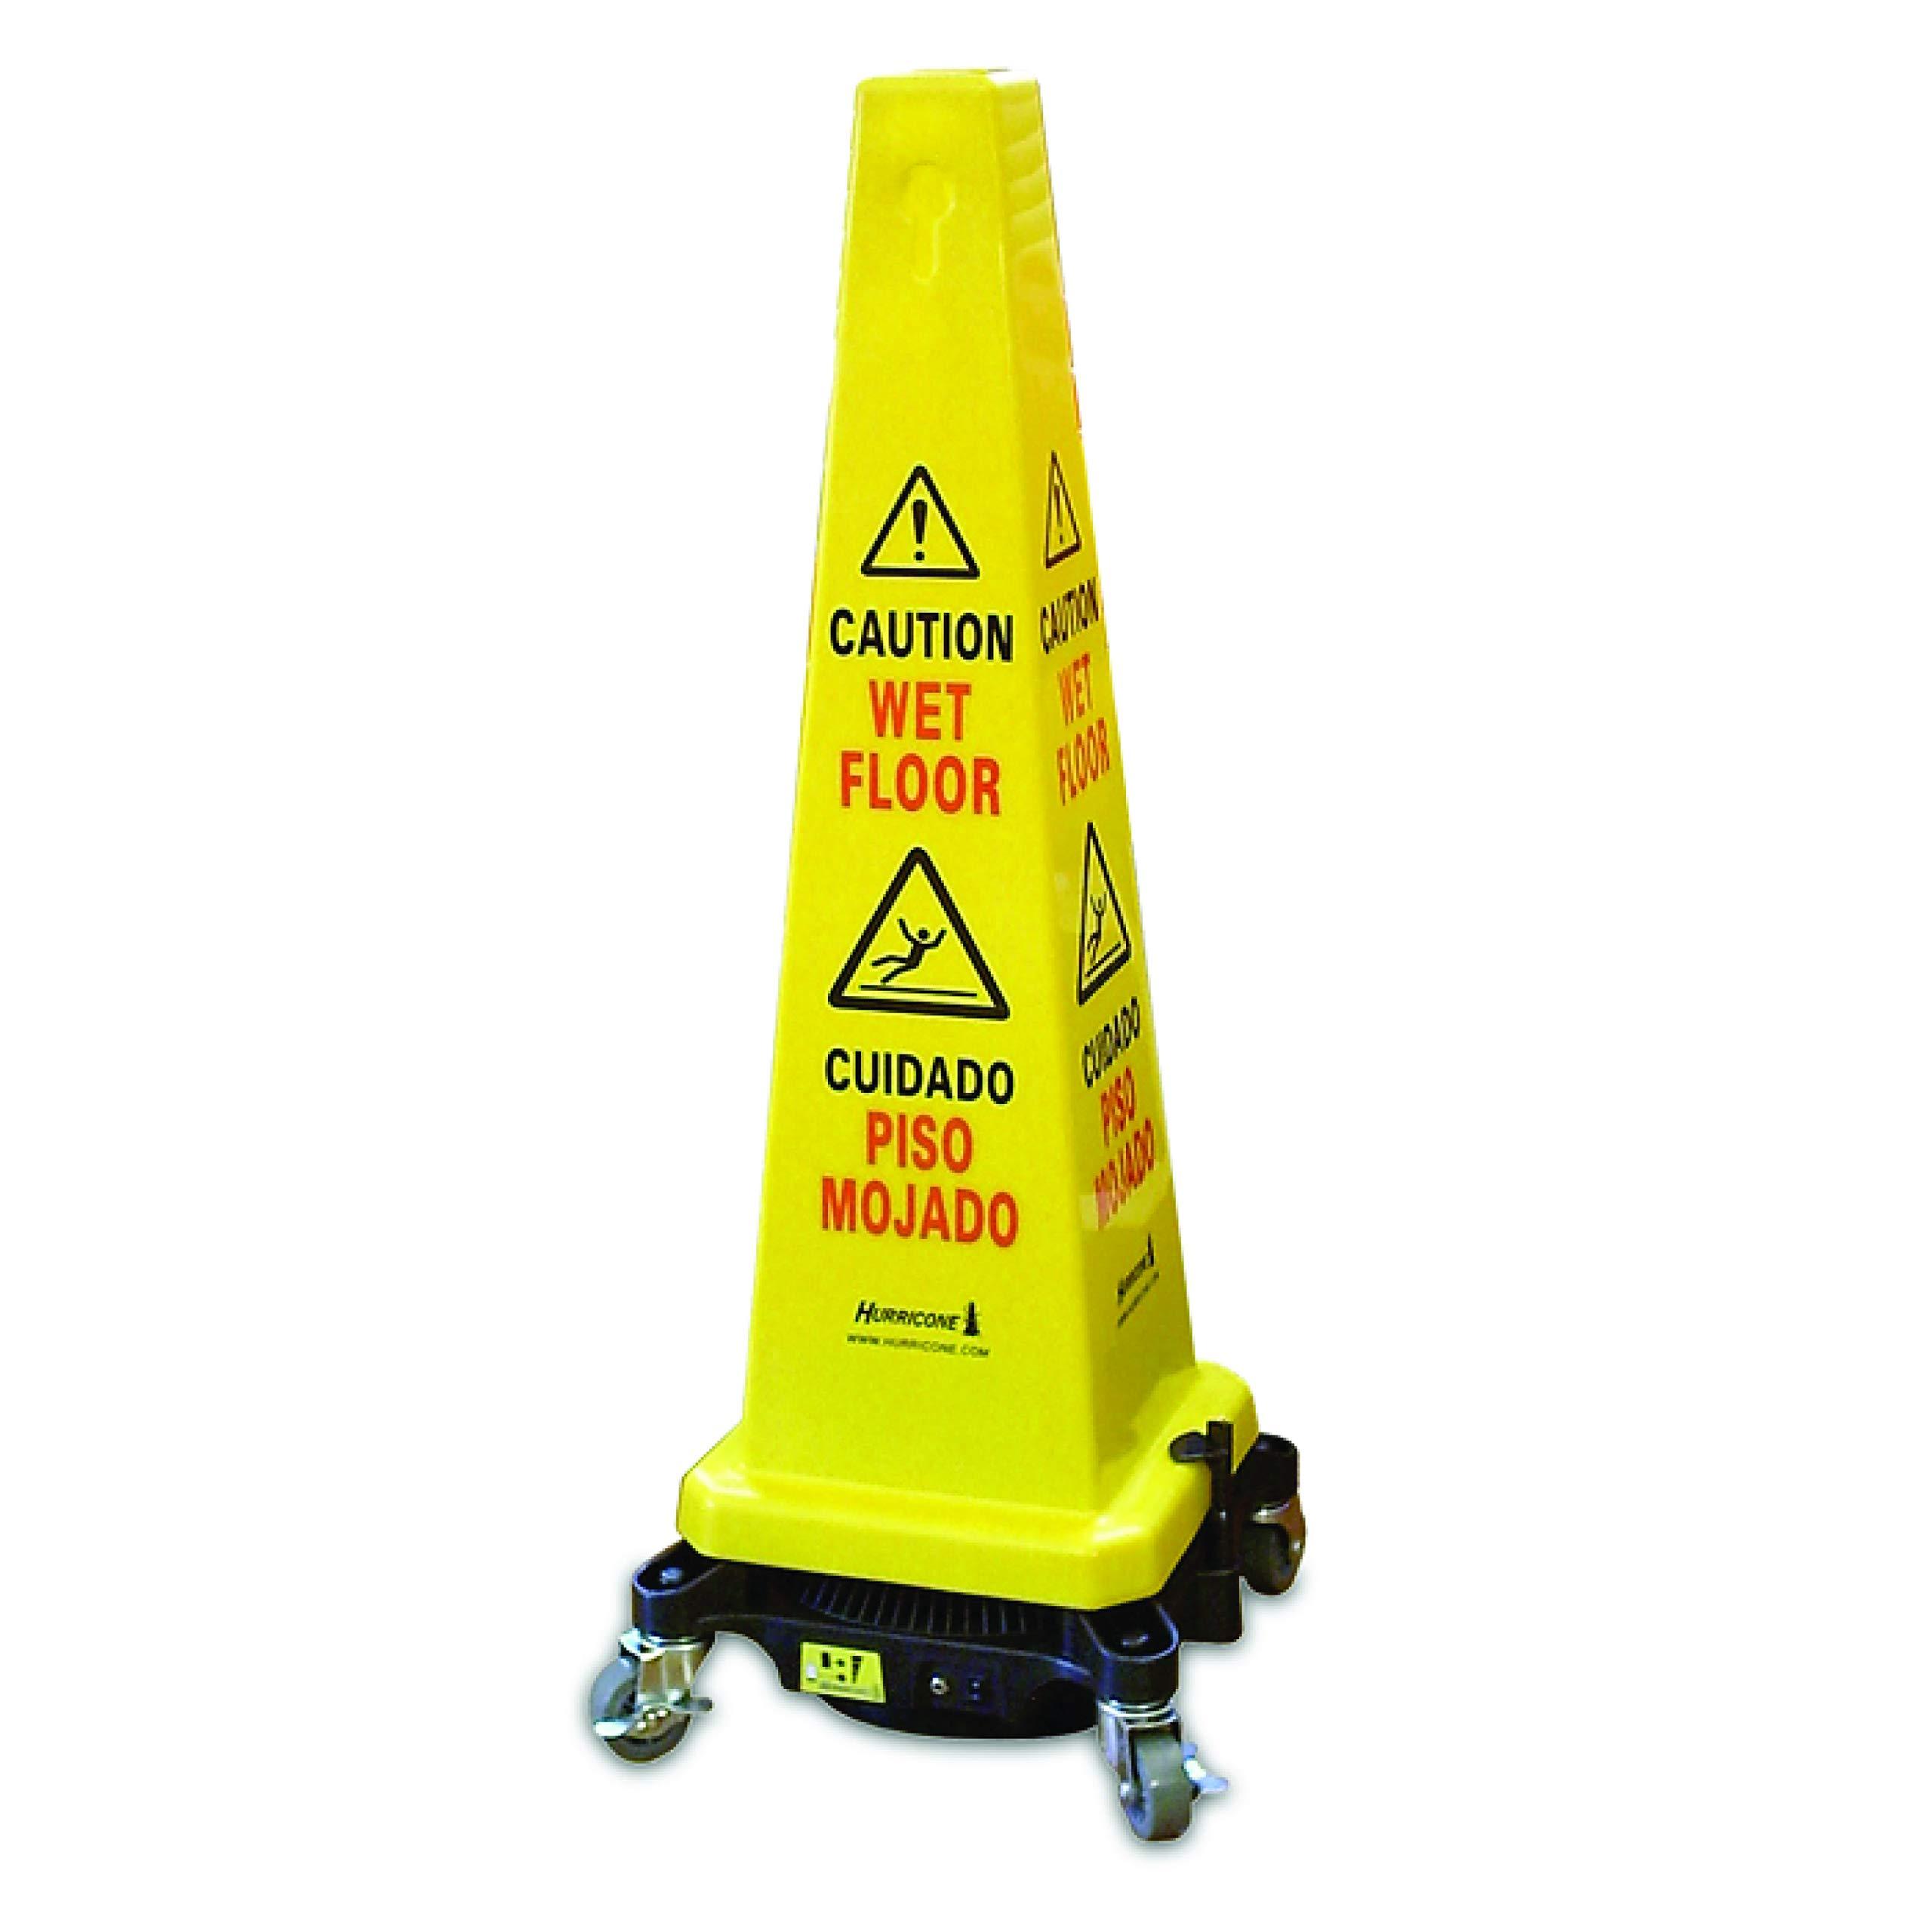 Hurricone Floor Dryer & Safety Cone Hurricone Floor Dryer, Yellow